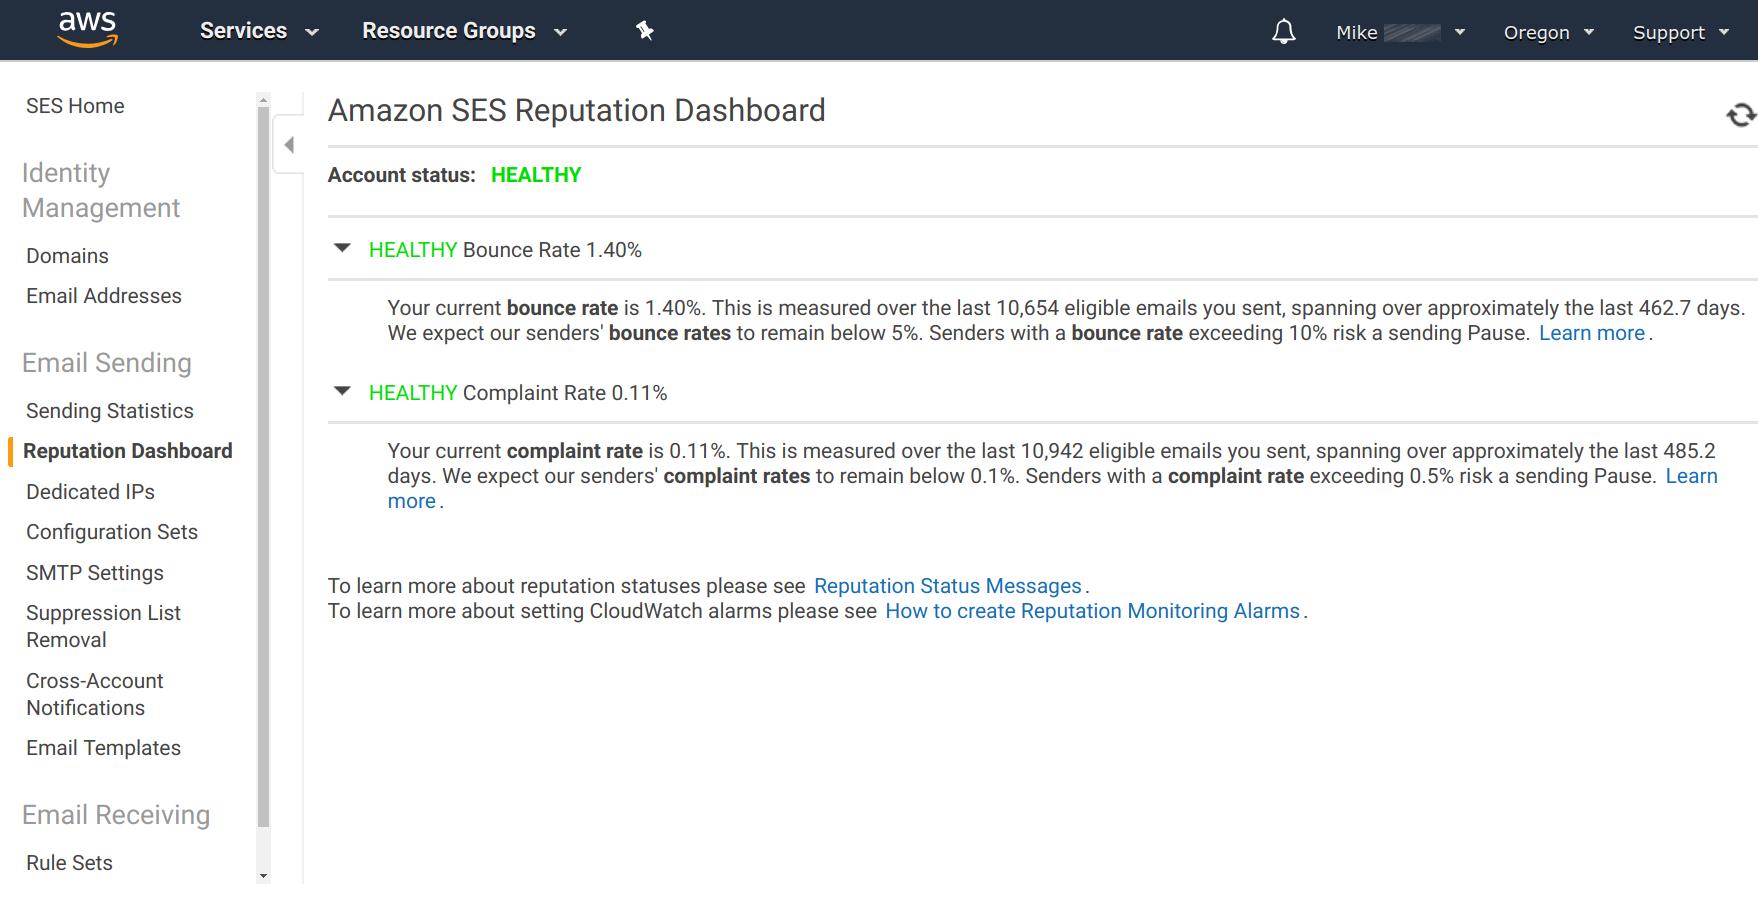 Amazon SES - Reputation Dashboard